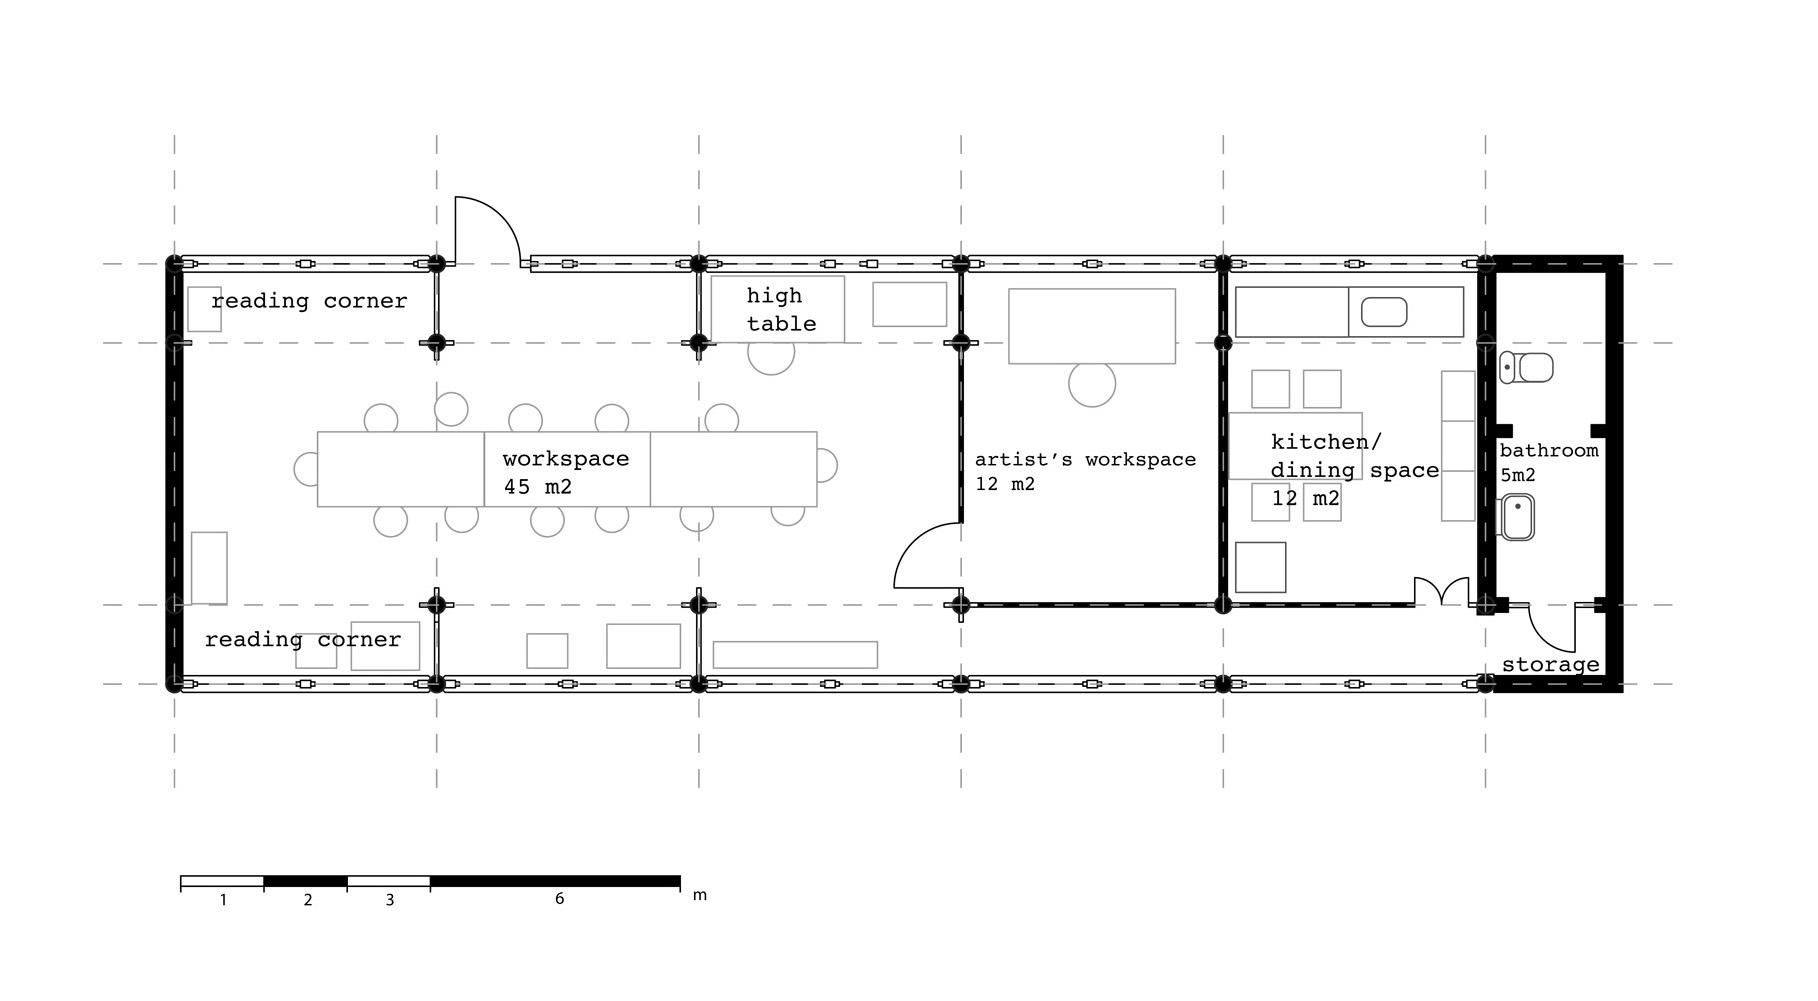 IFP studio plan